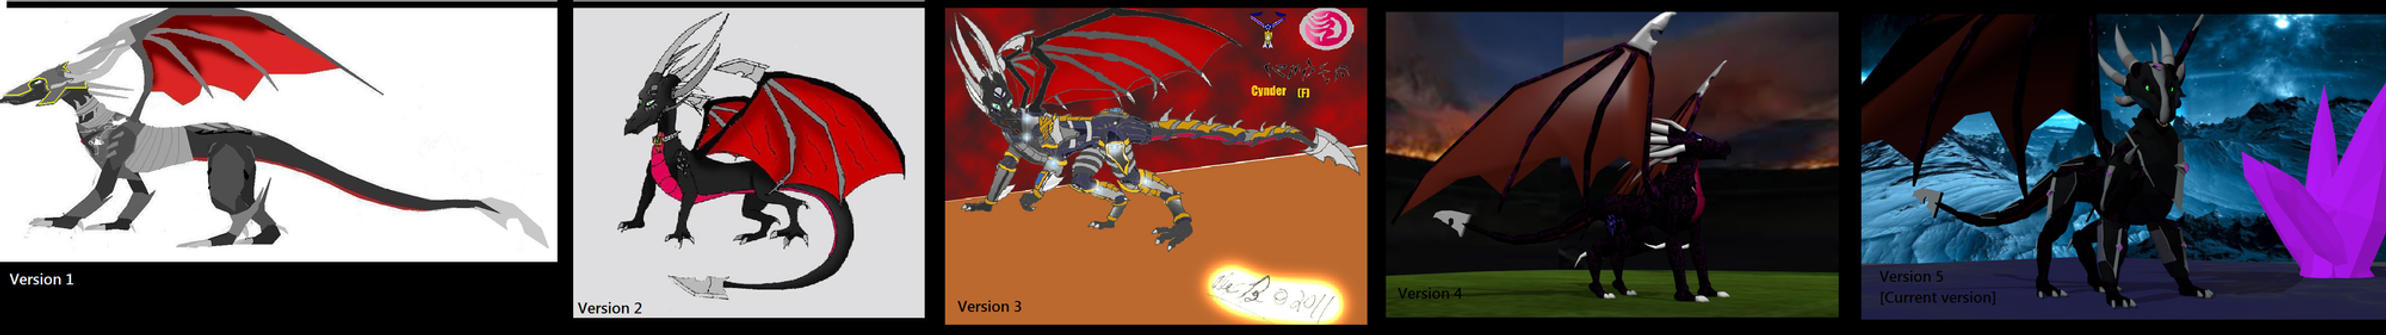 Character Evolution - Cynder v1-5 by Marksman104